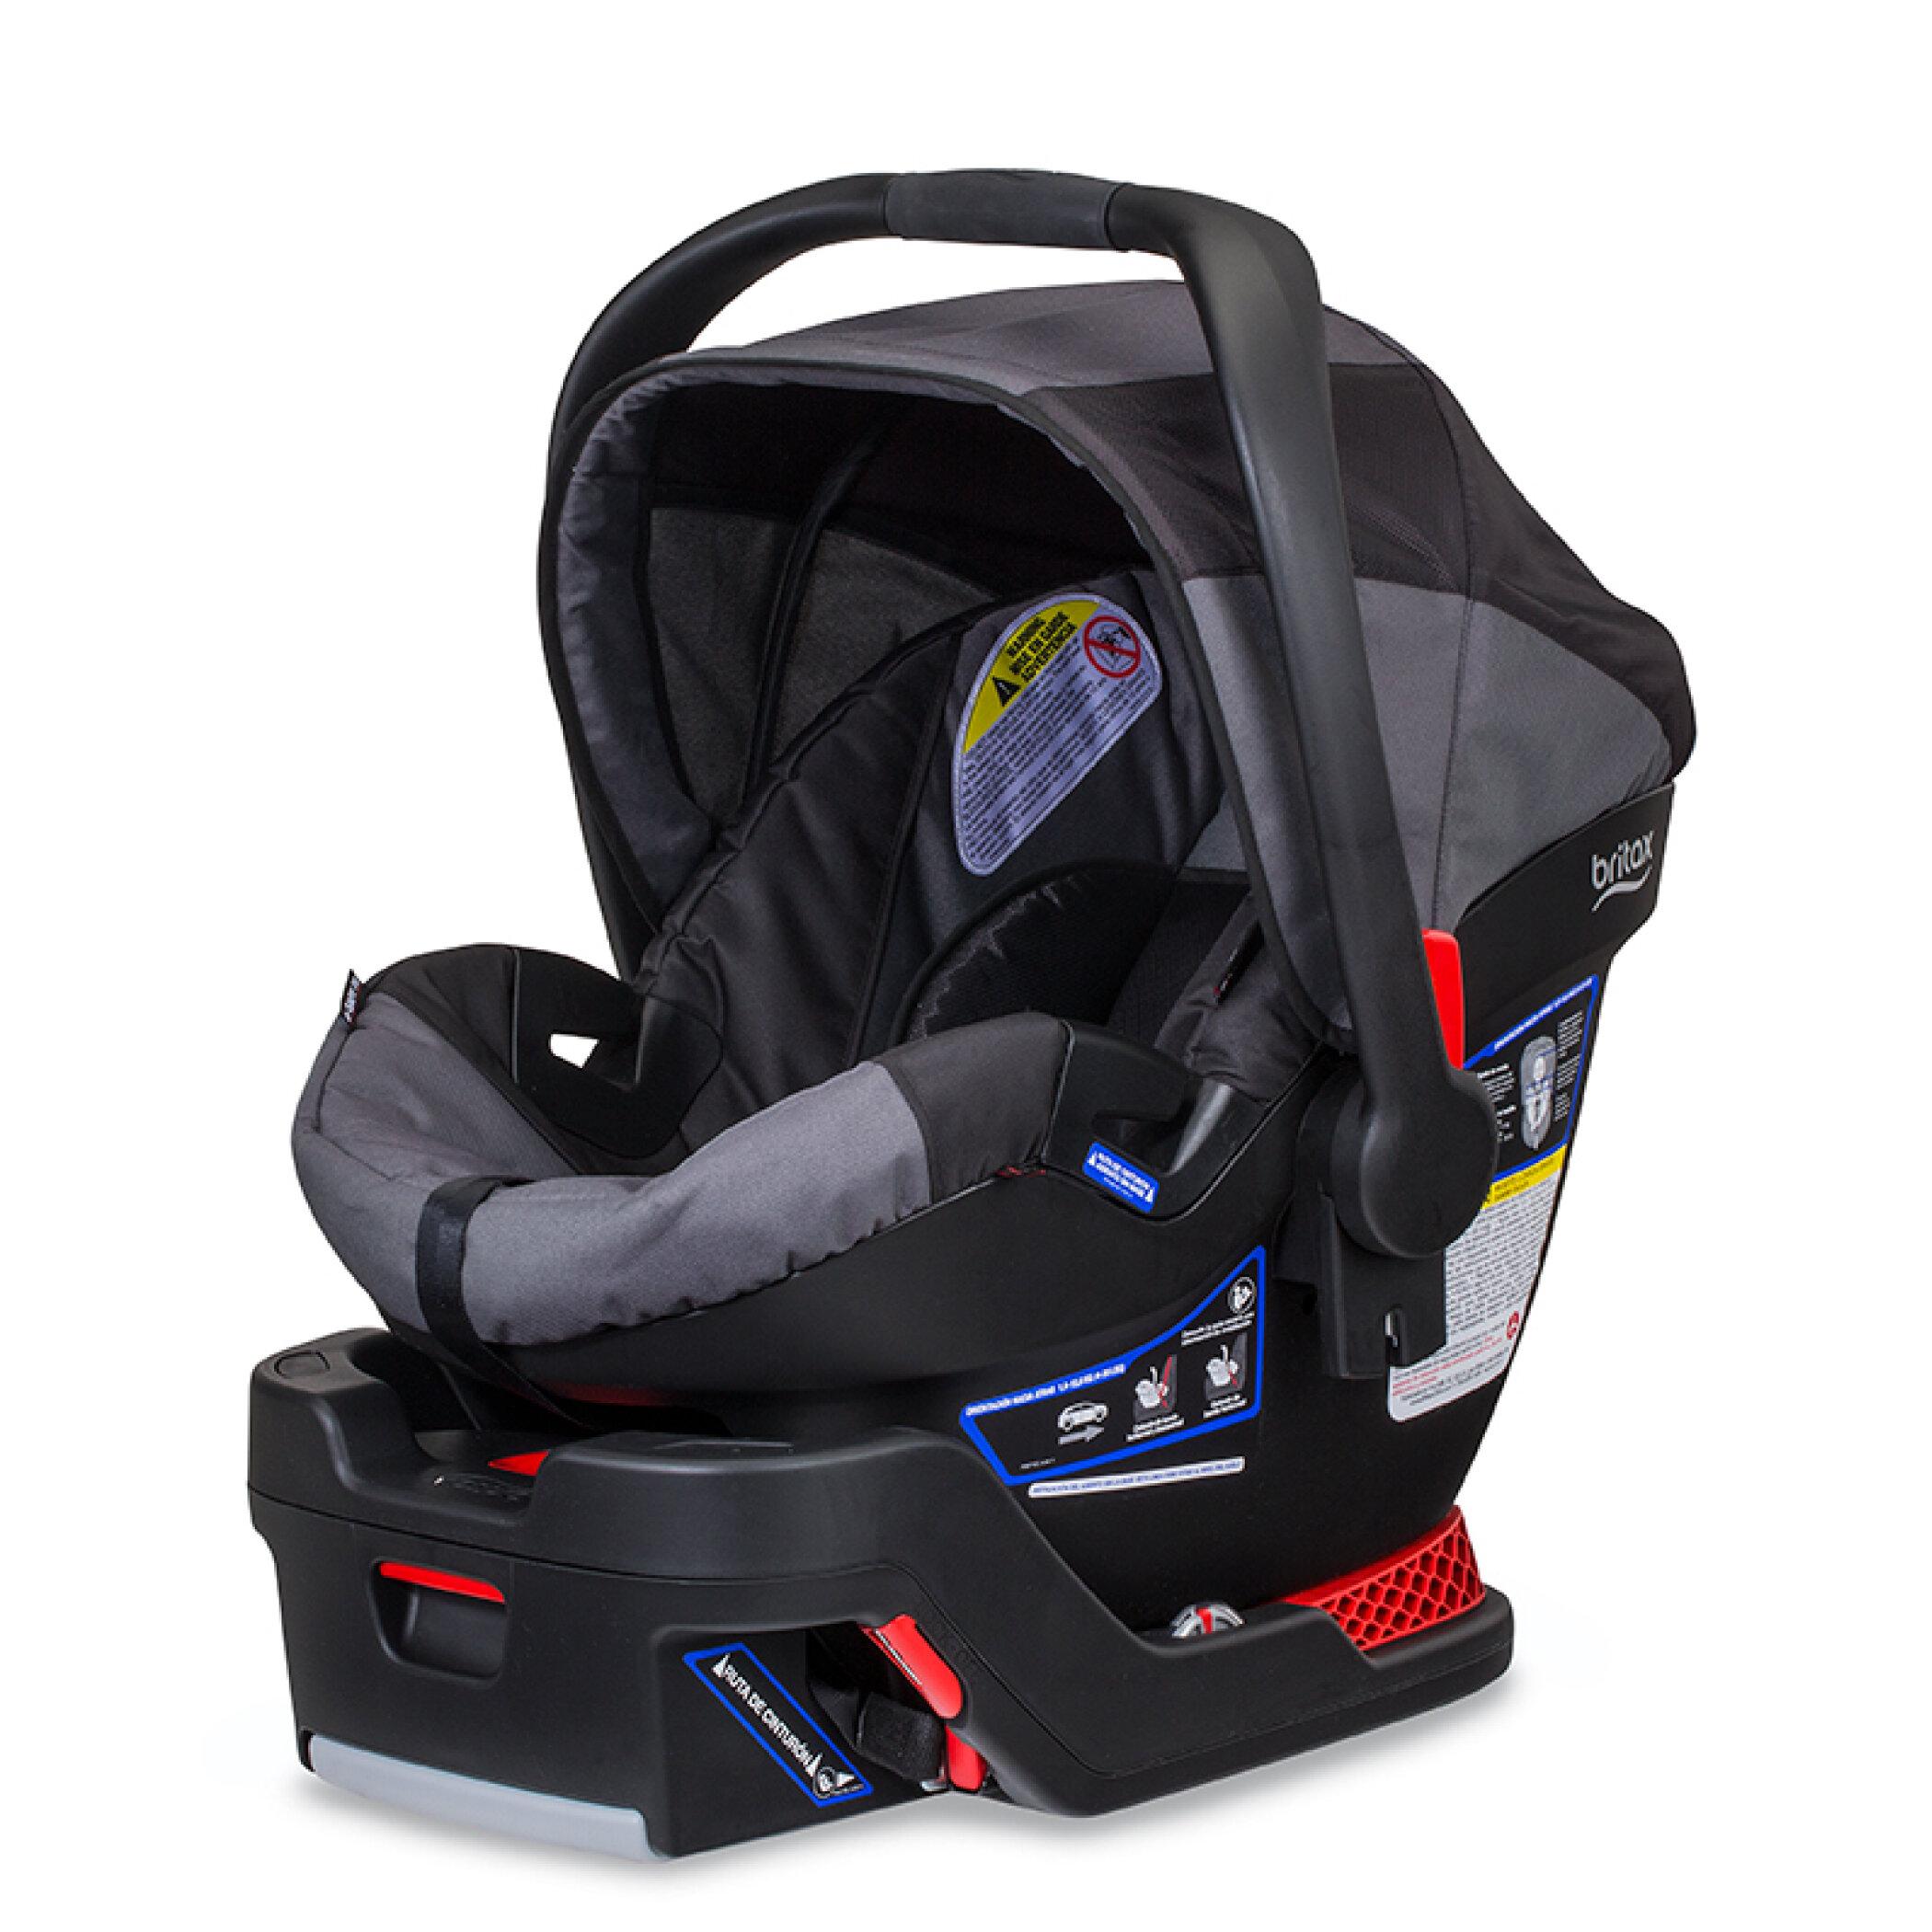 BOB B-Safe 35 Infant Car Seat Baby Child Safety Black NEW